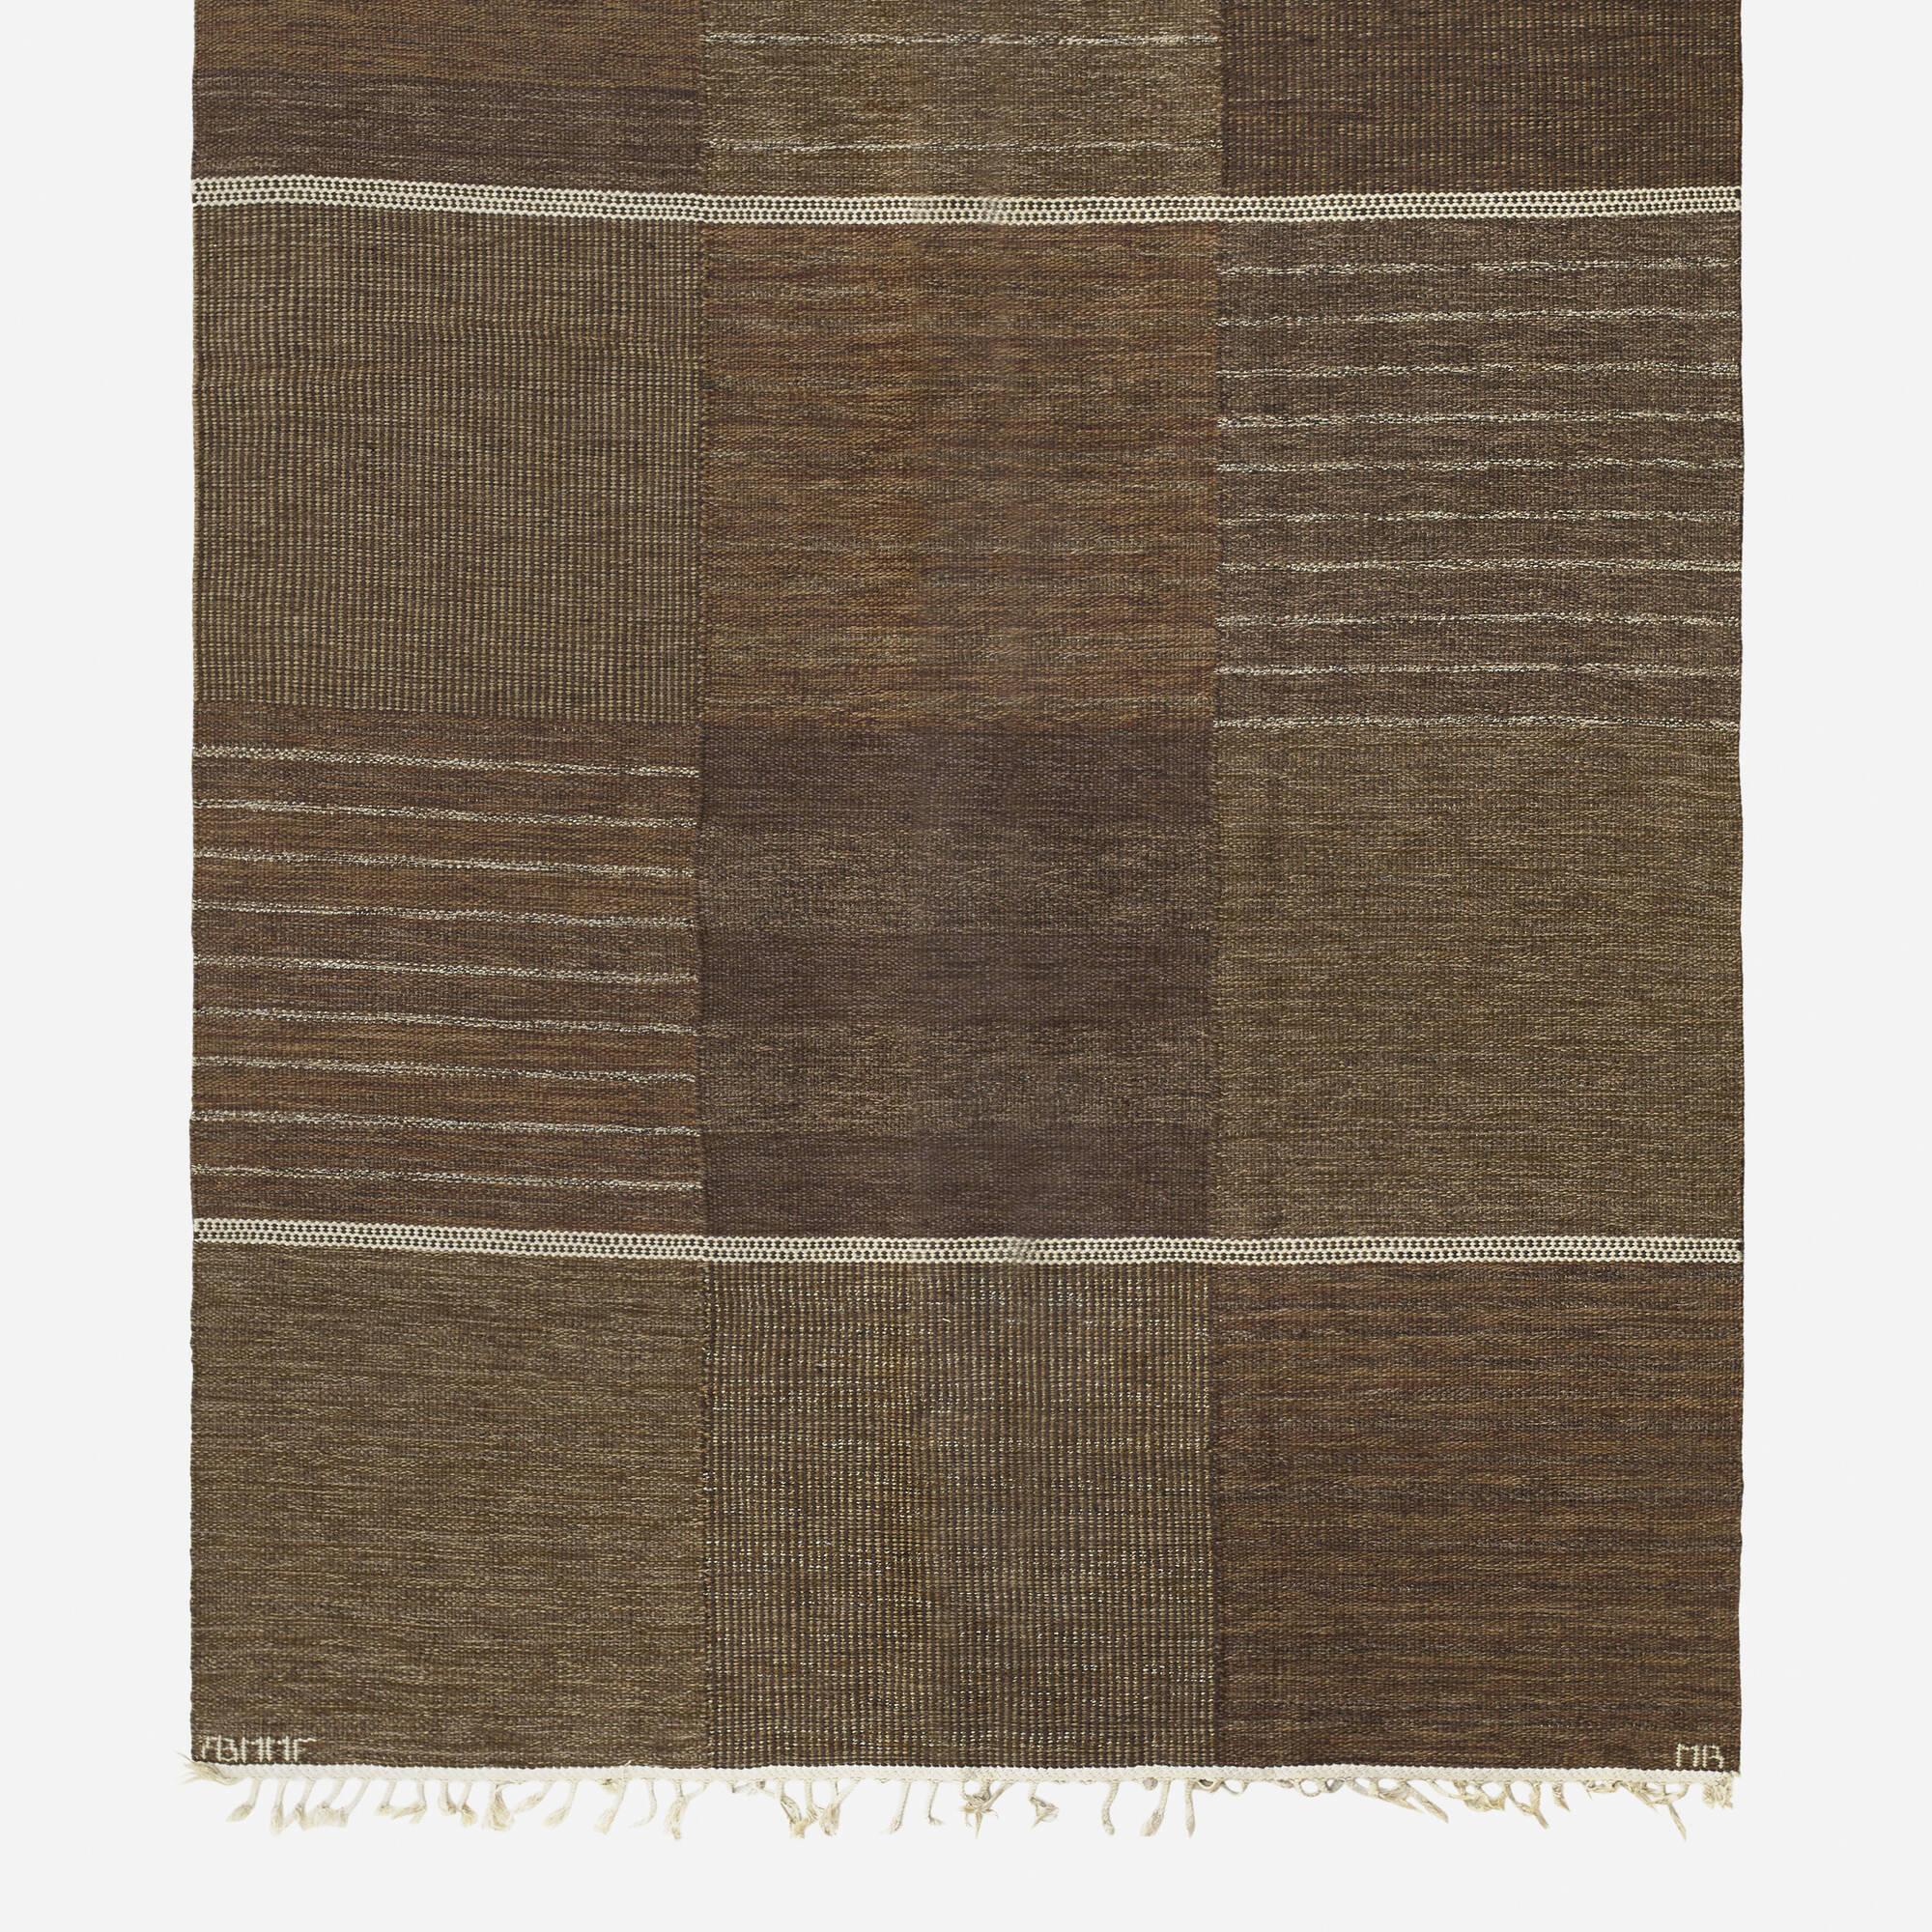 163: Marianne Richter / Tolv Rutor flatweave carpet (2 of 2)